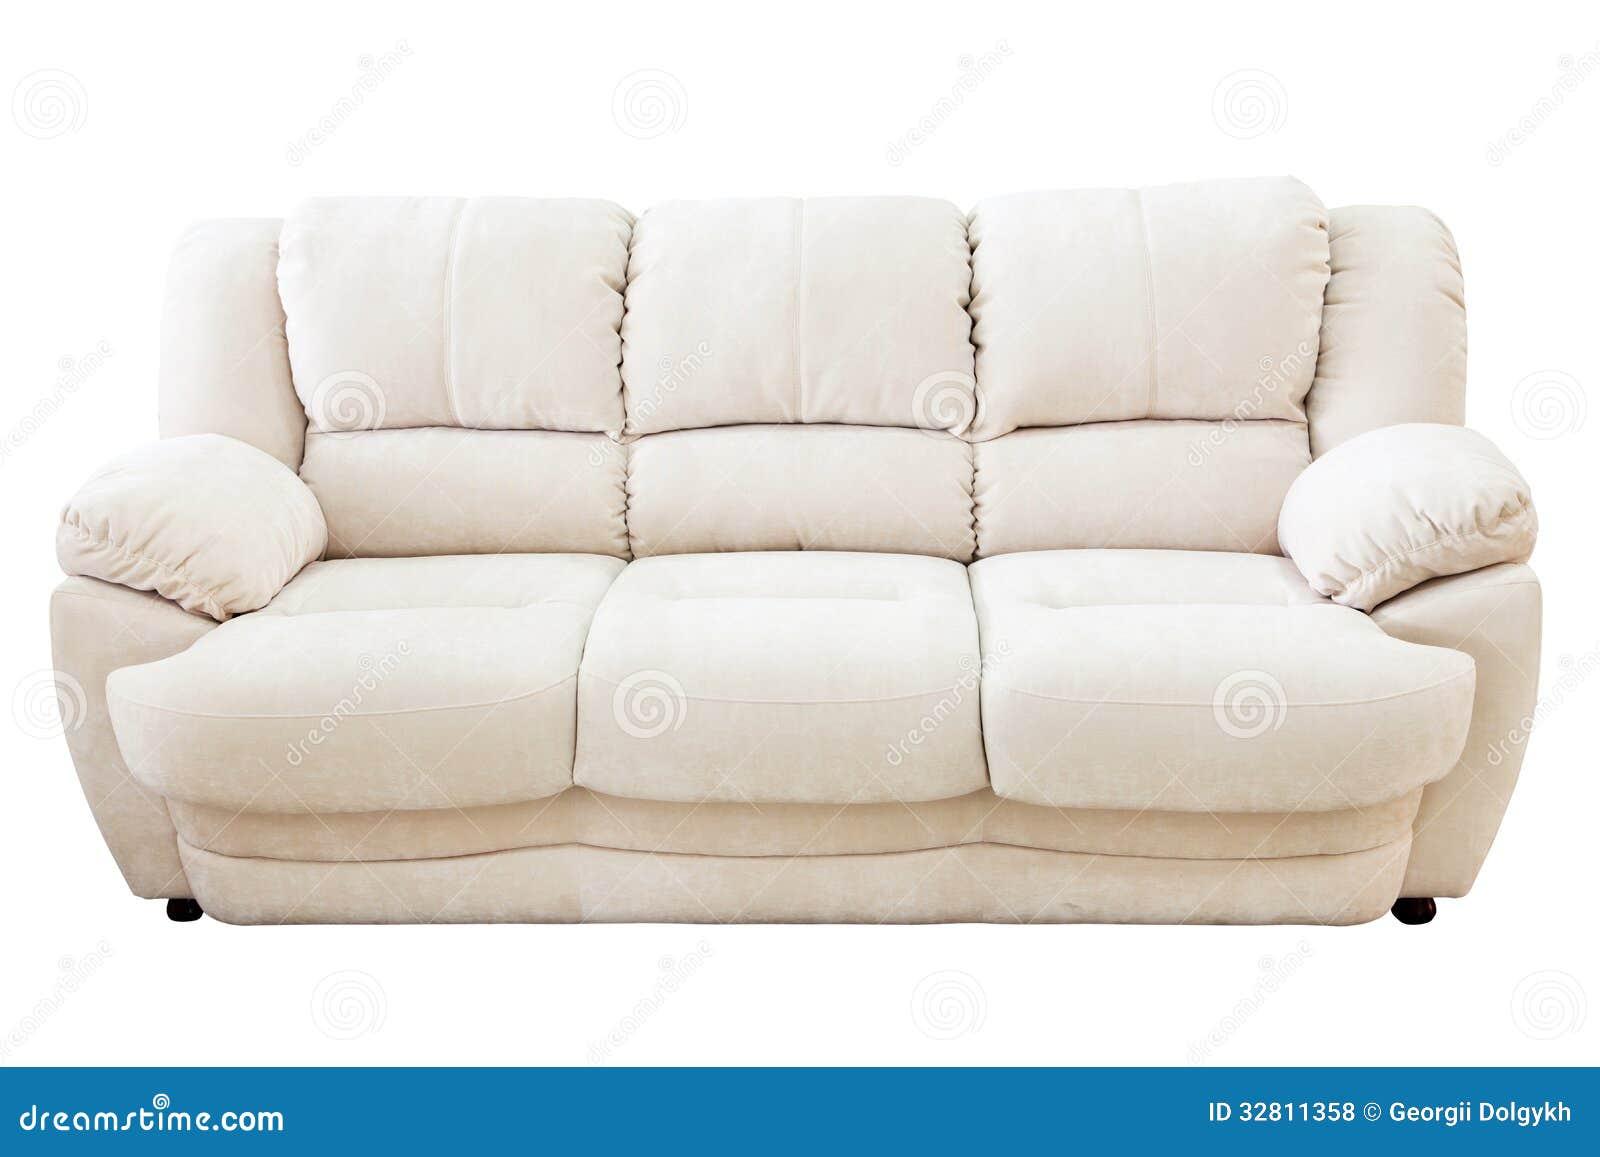 Sofa Isolated On White Background Royalty Free Stock